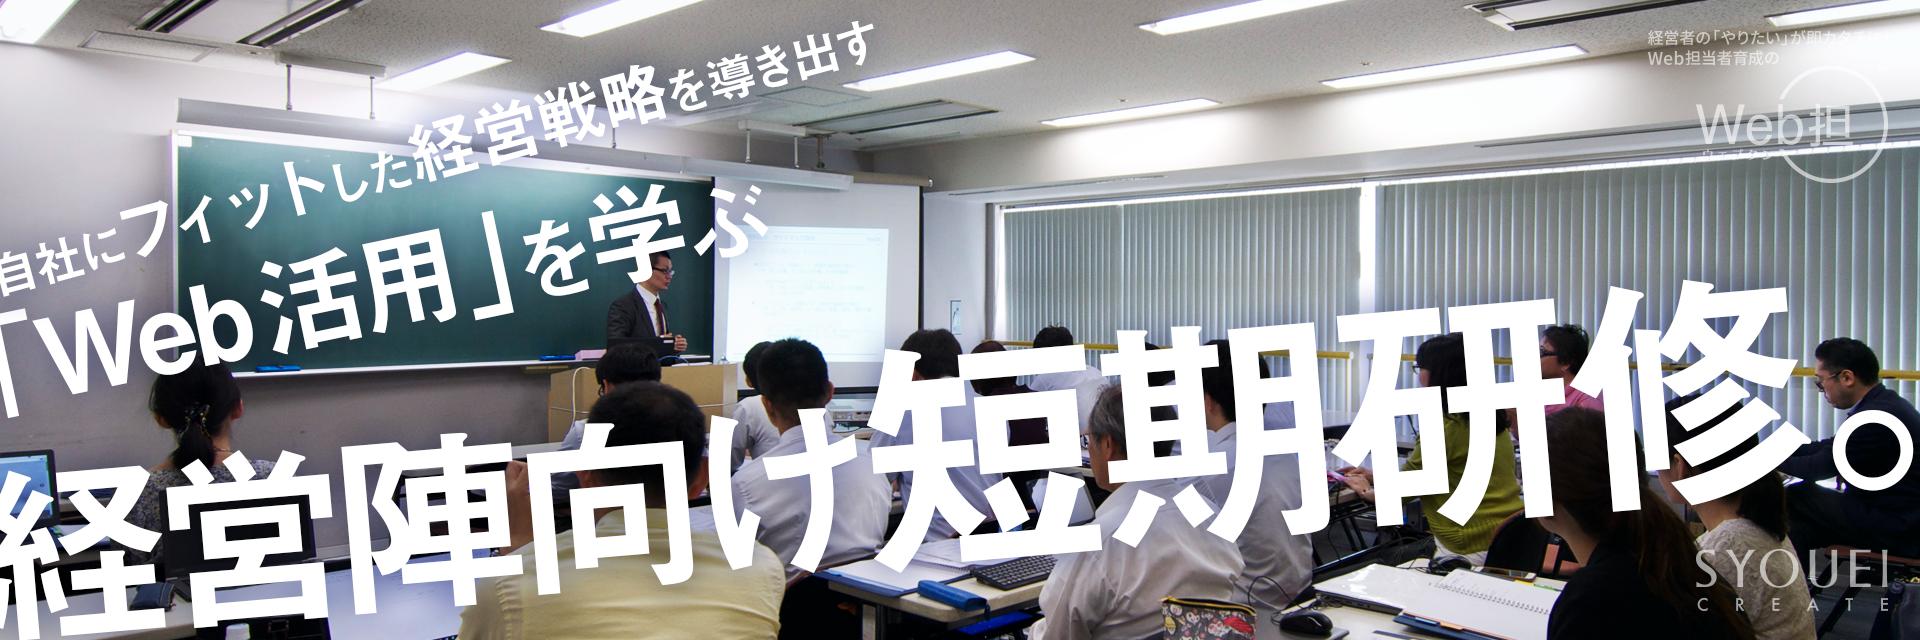 Web活用を学ぶ、経営陣向け短期研修。